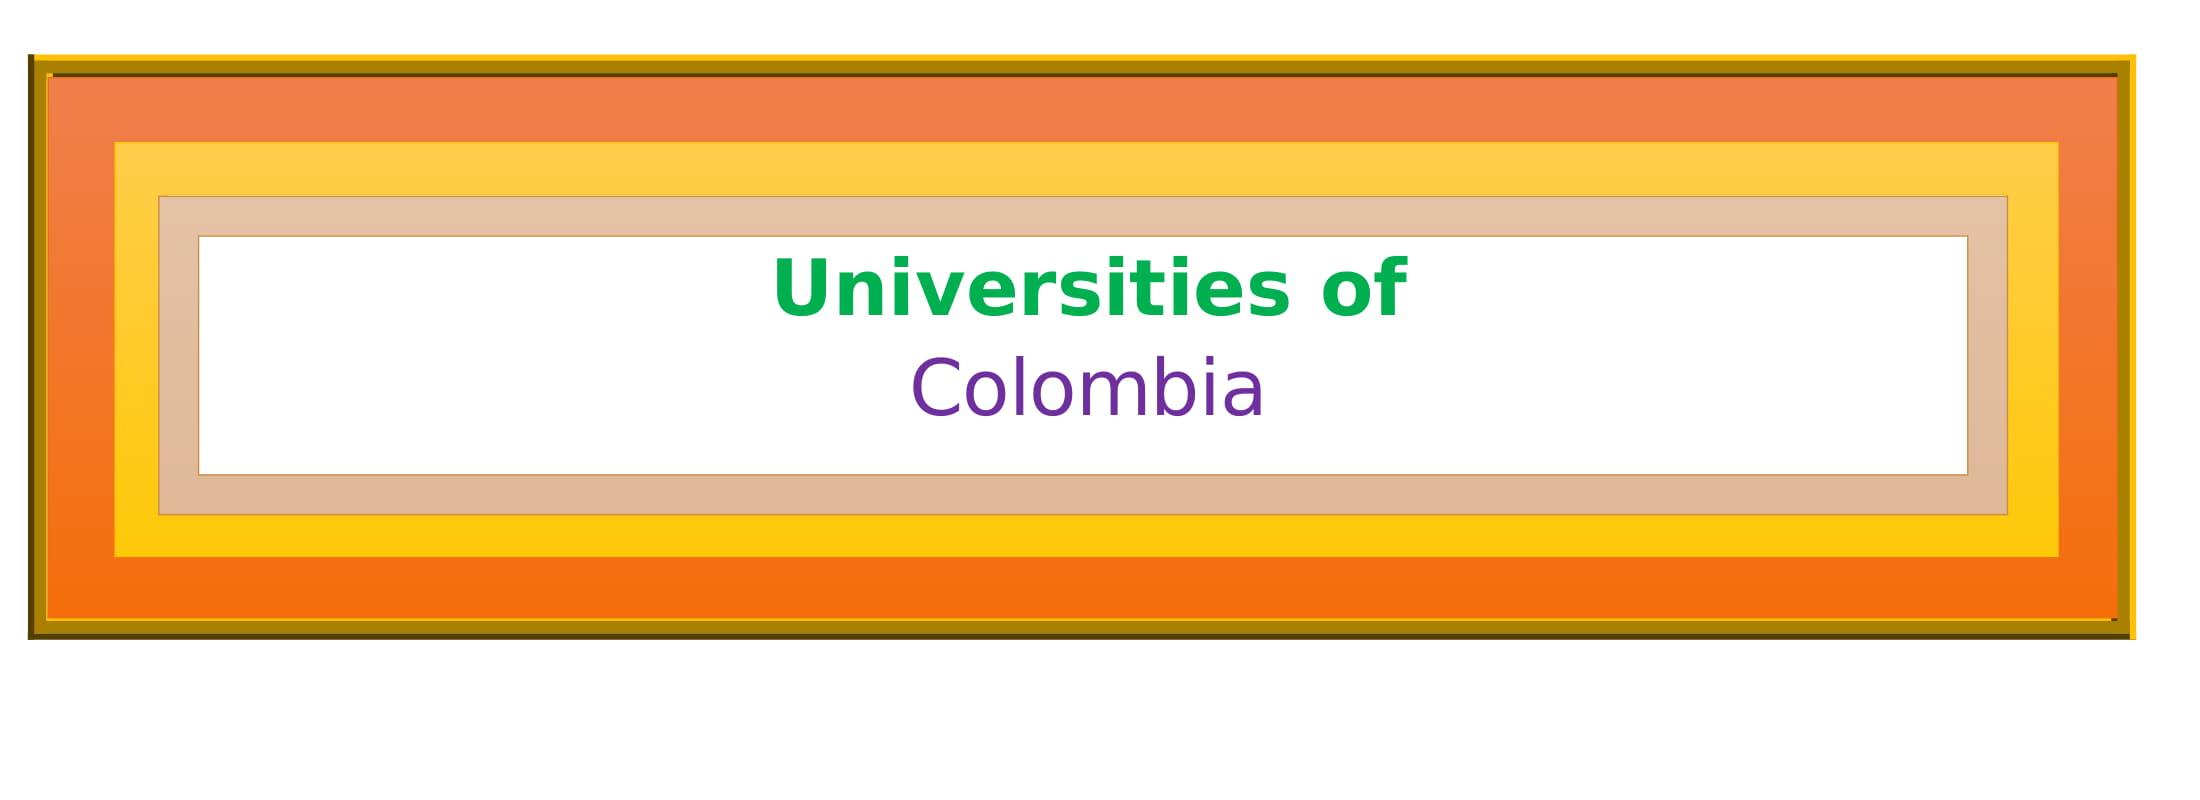 List of Universities in Colombia